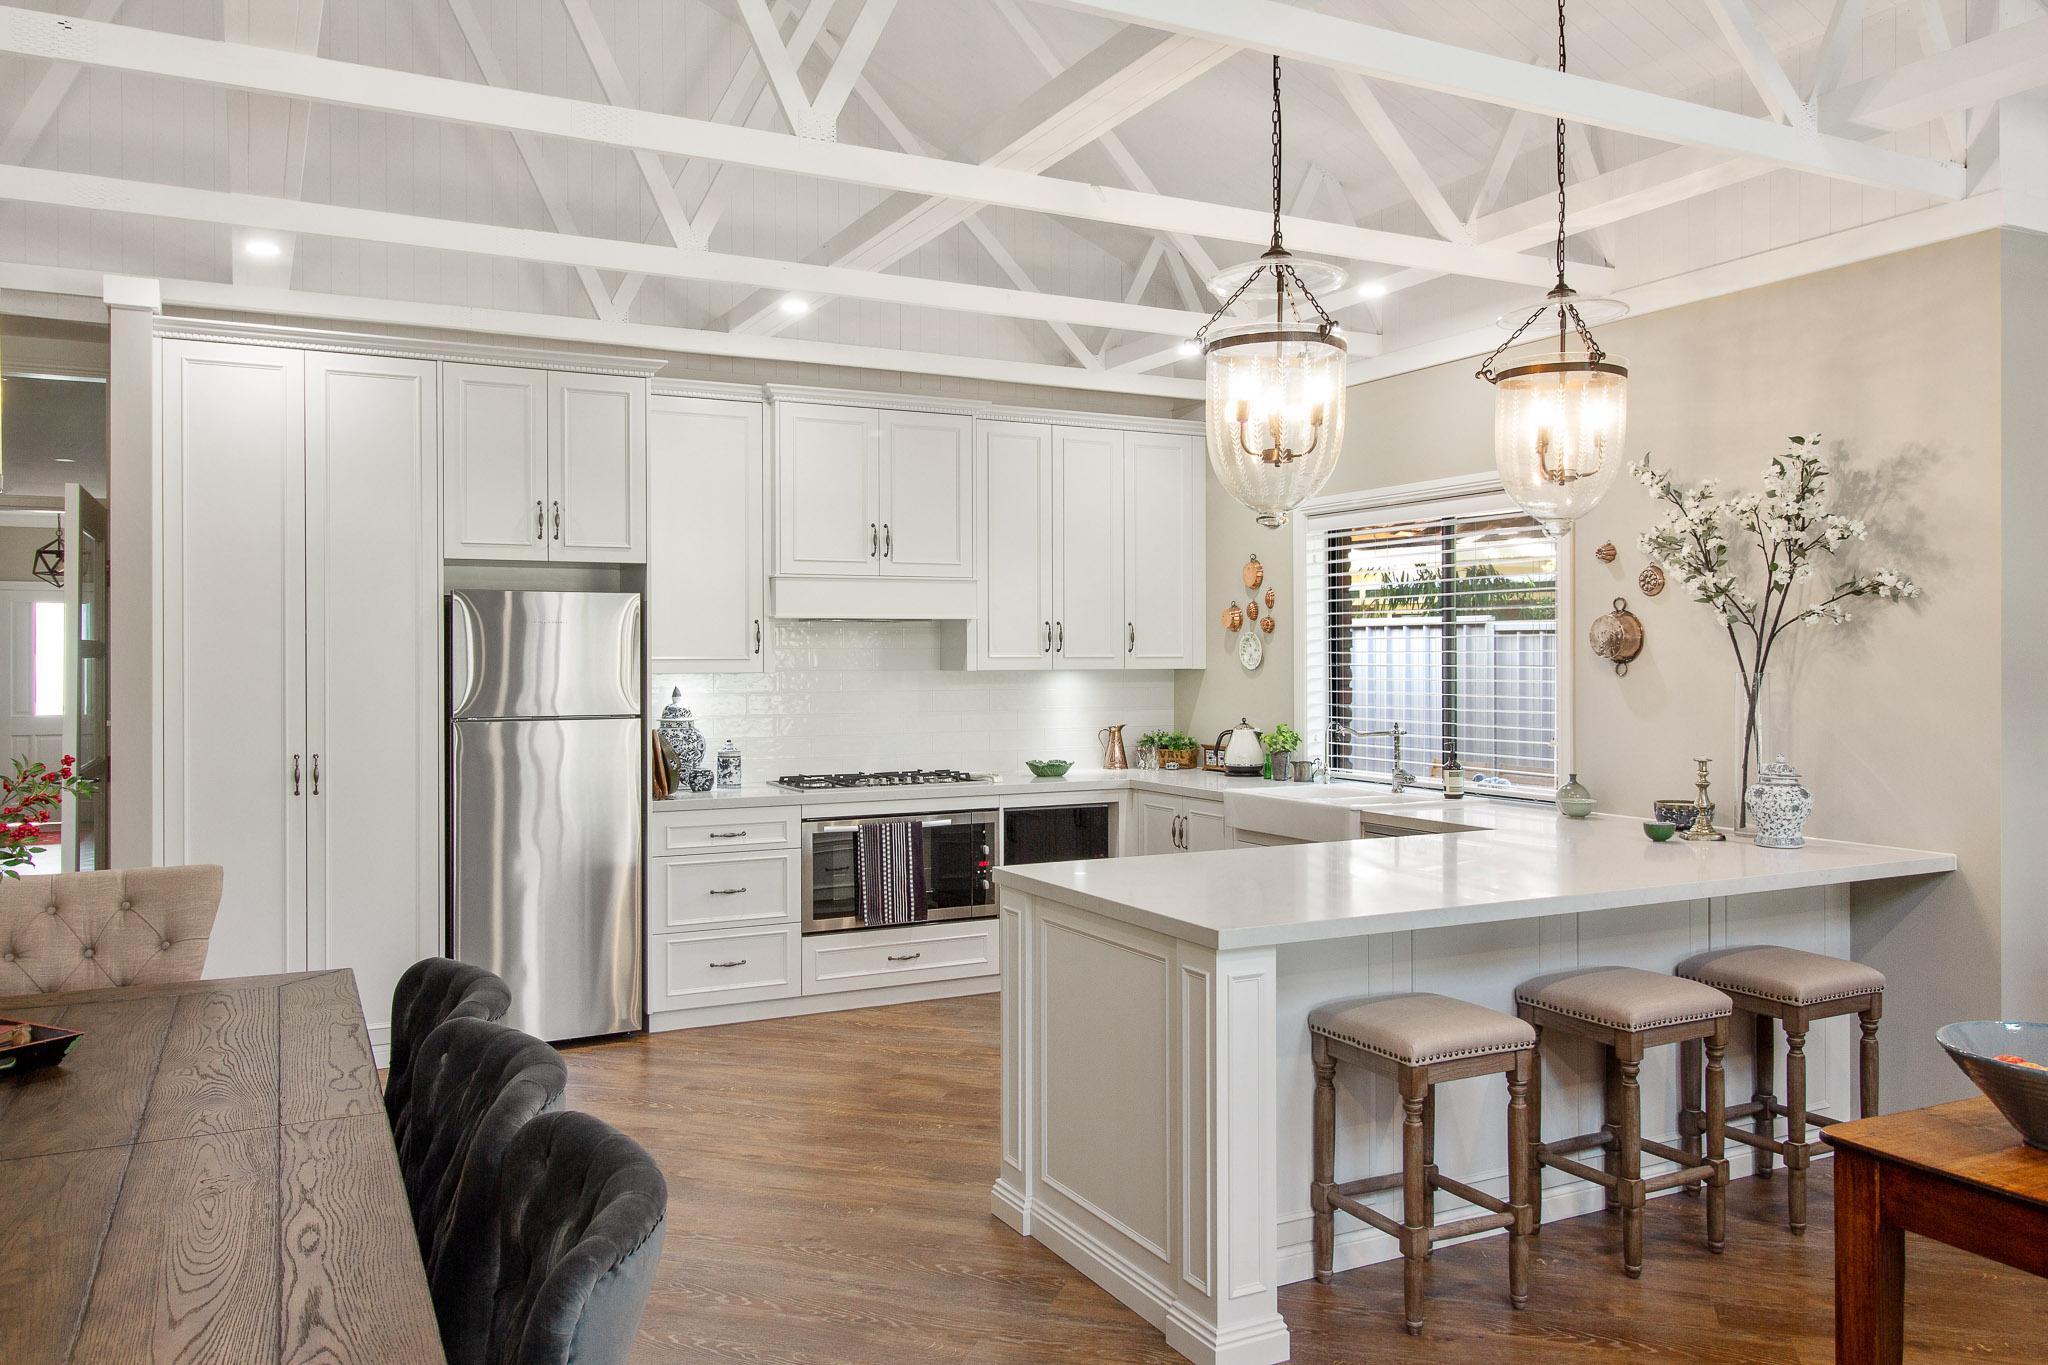 promotional, kitchen, house, property